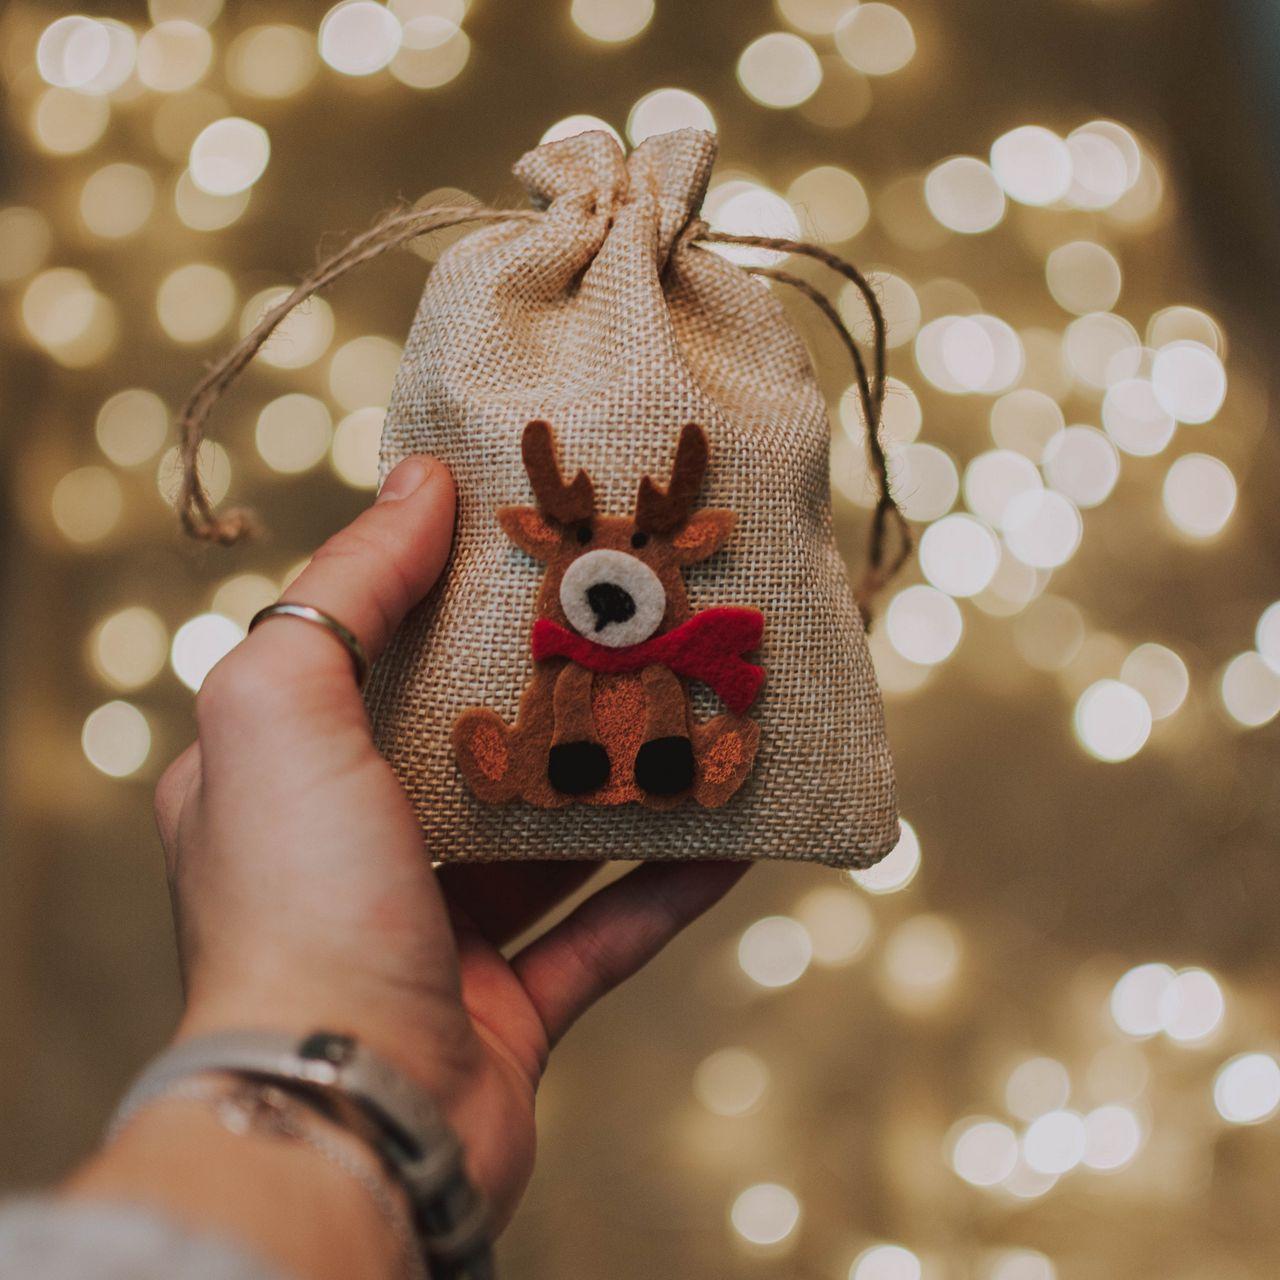 1280x1280 Wallpaper gift, new year, christmas, deer, hand